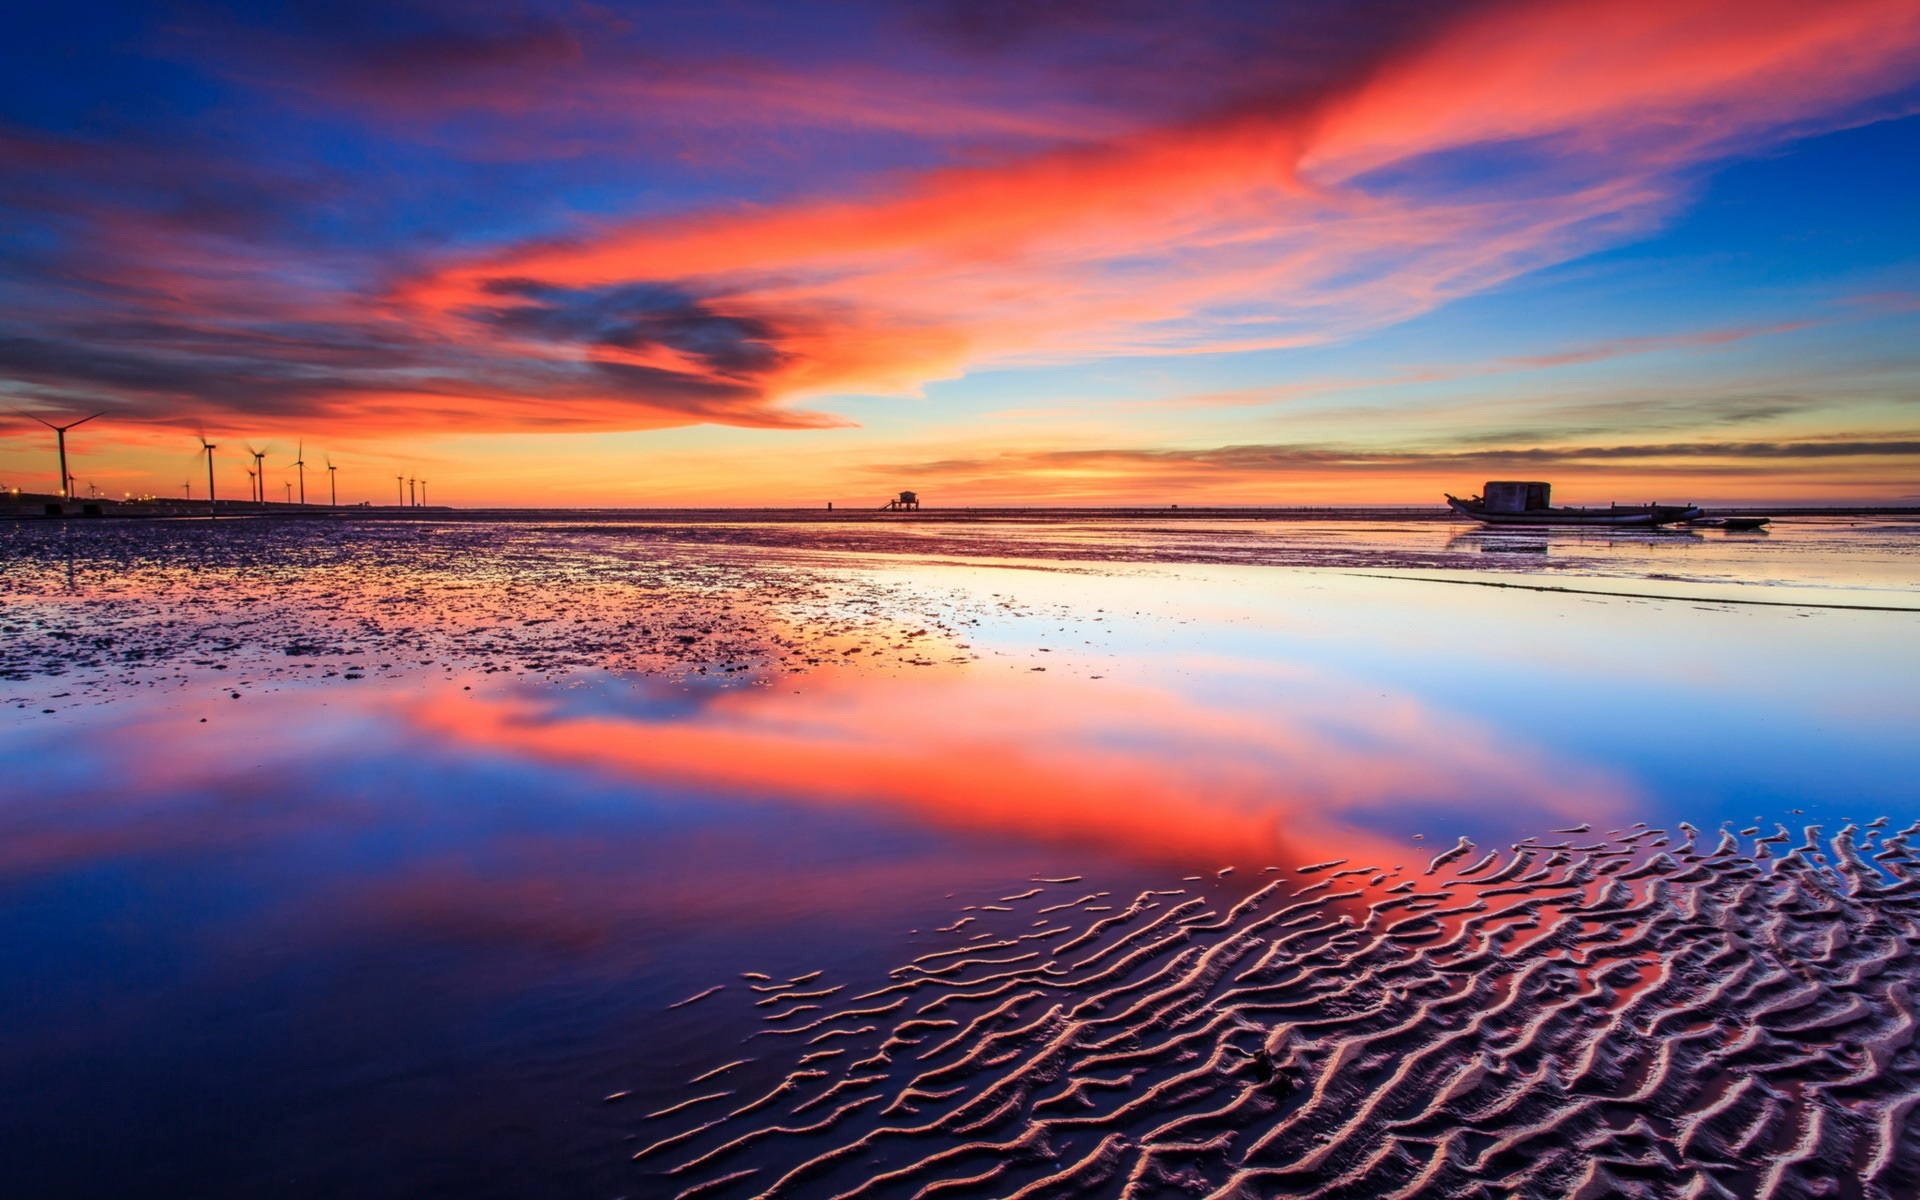 beach sunset 1920x1200 2314 - photo #49